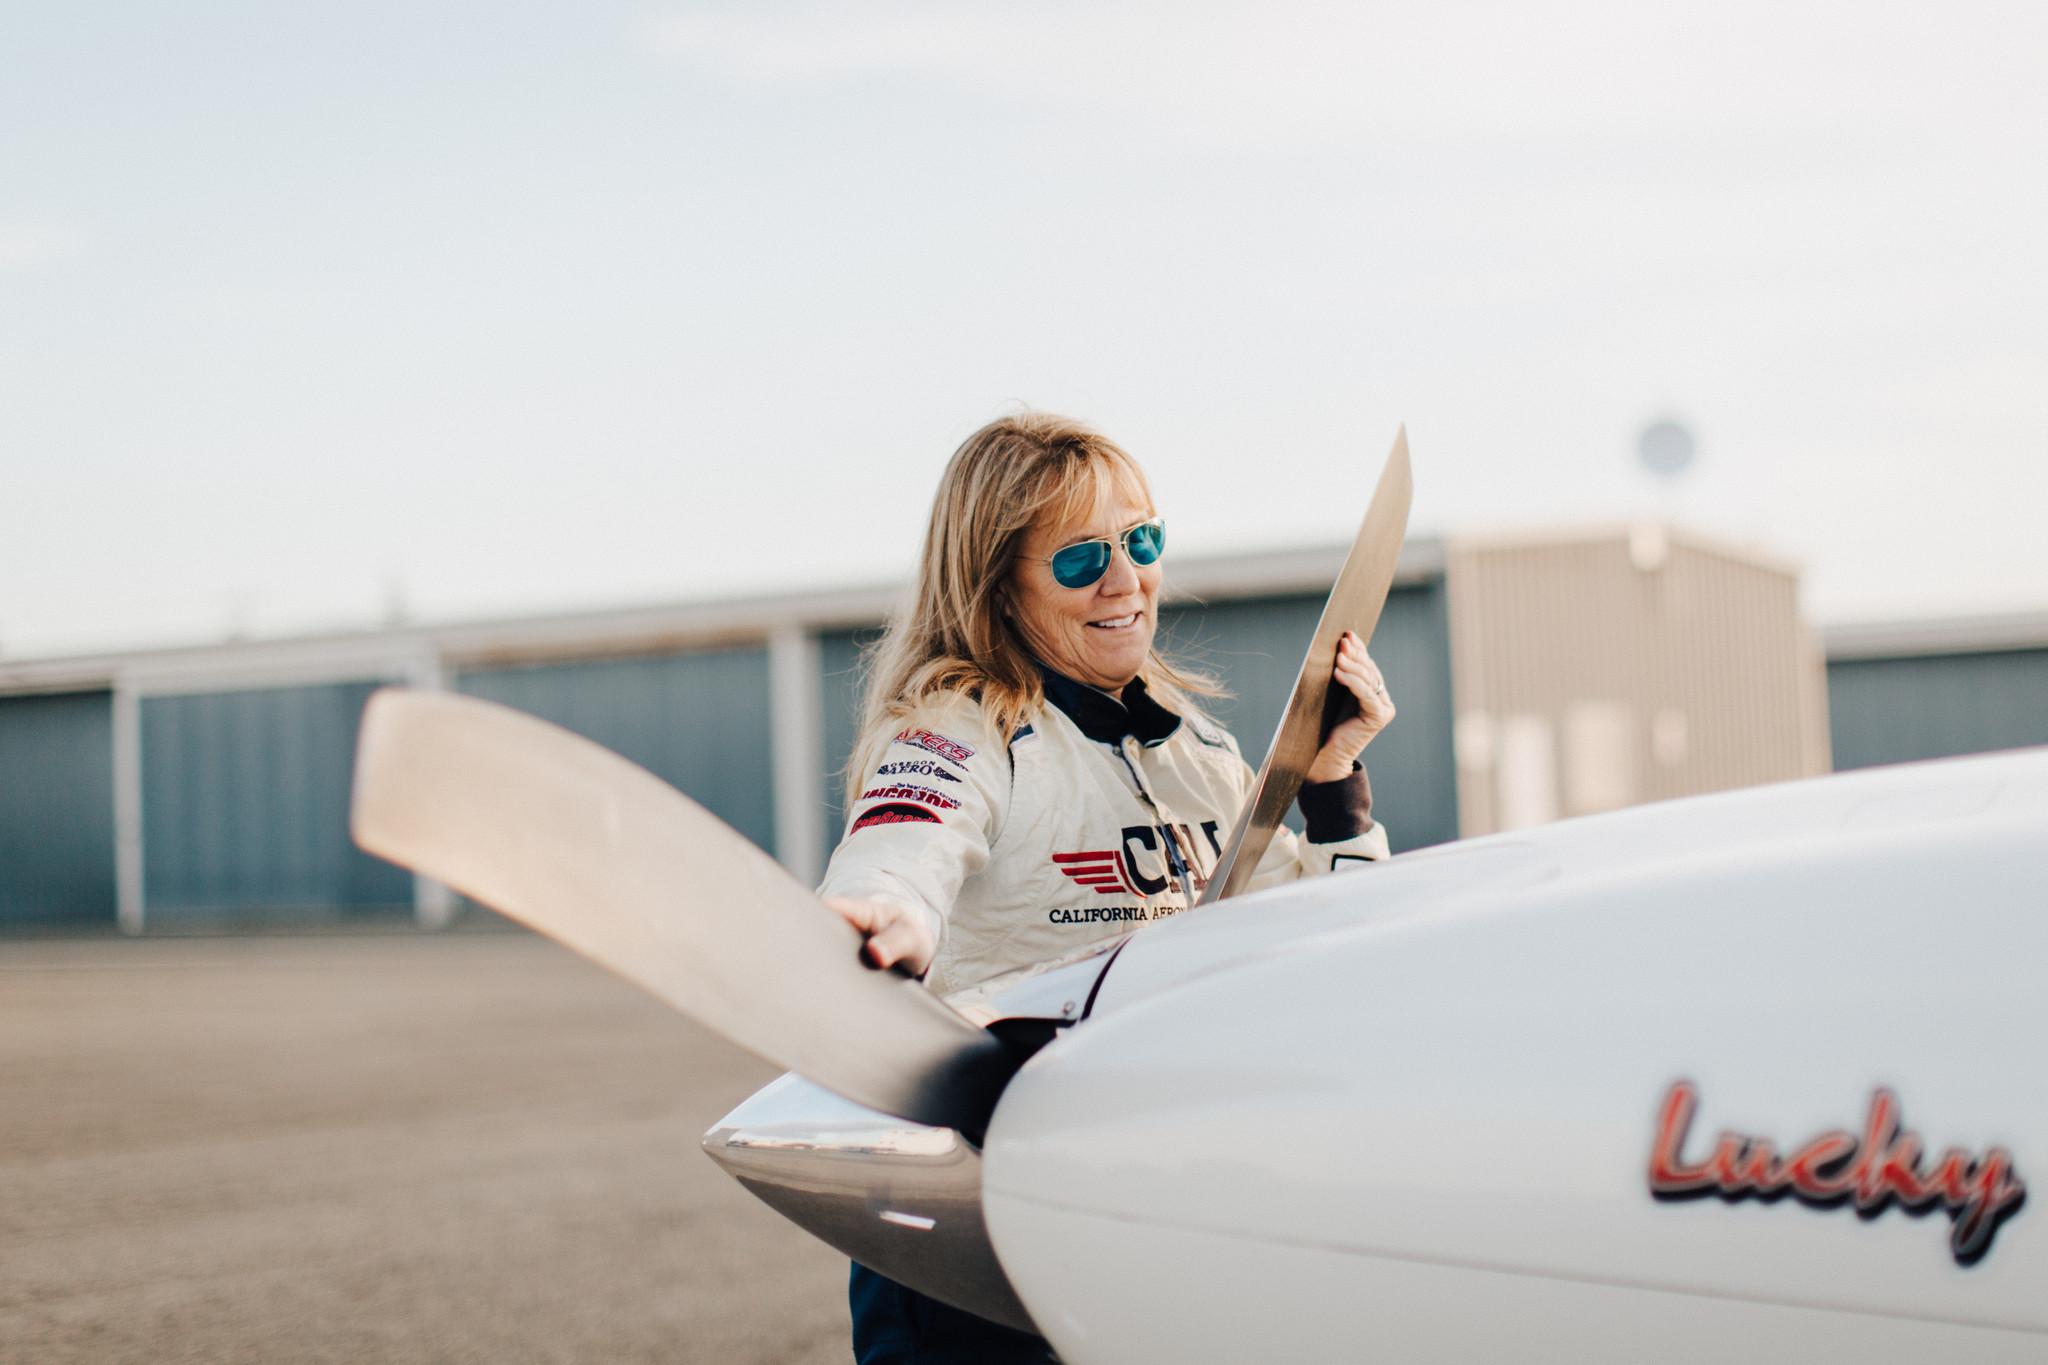 Press Release: Enter to Win Pilot Sunglasses for Women